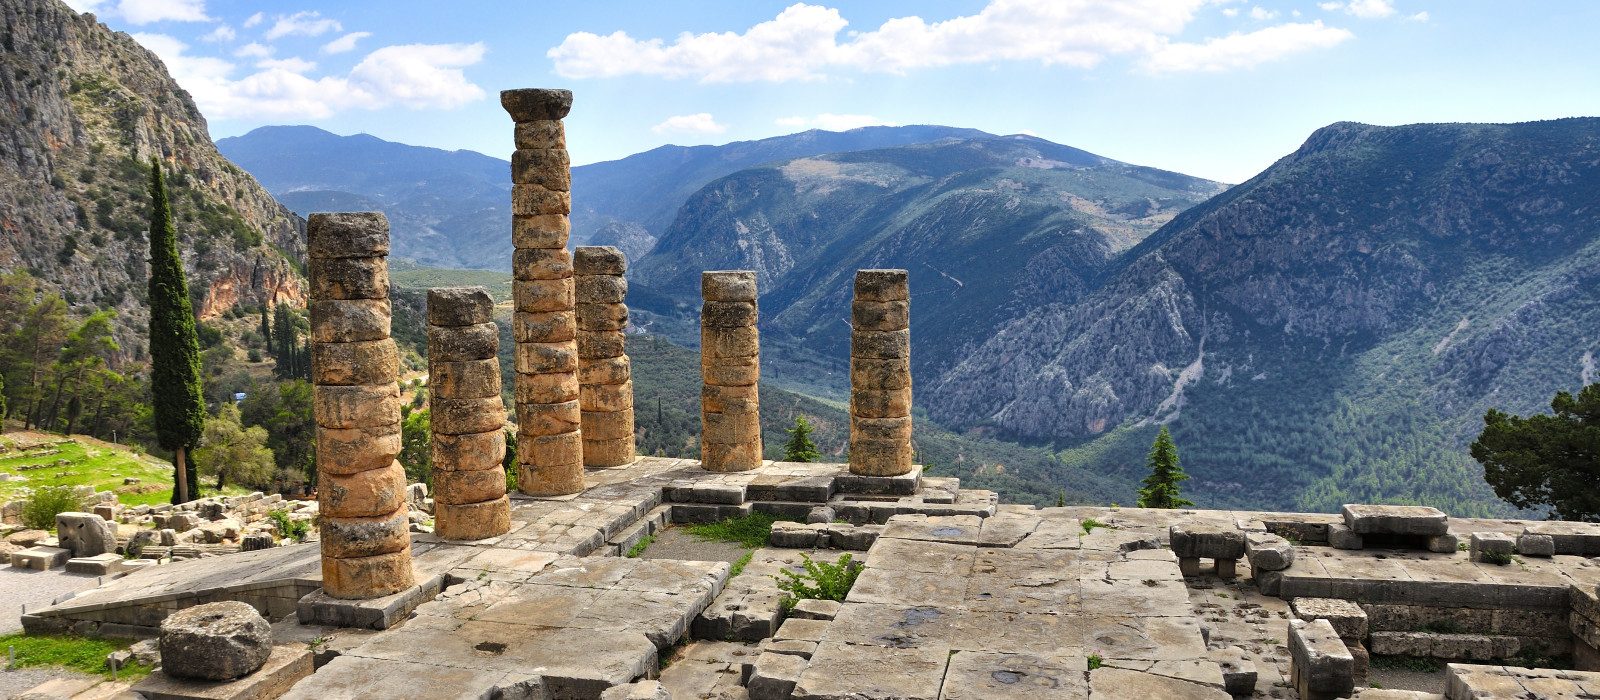 Reiseziel Delphi Griechenland